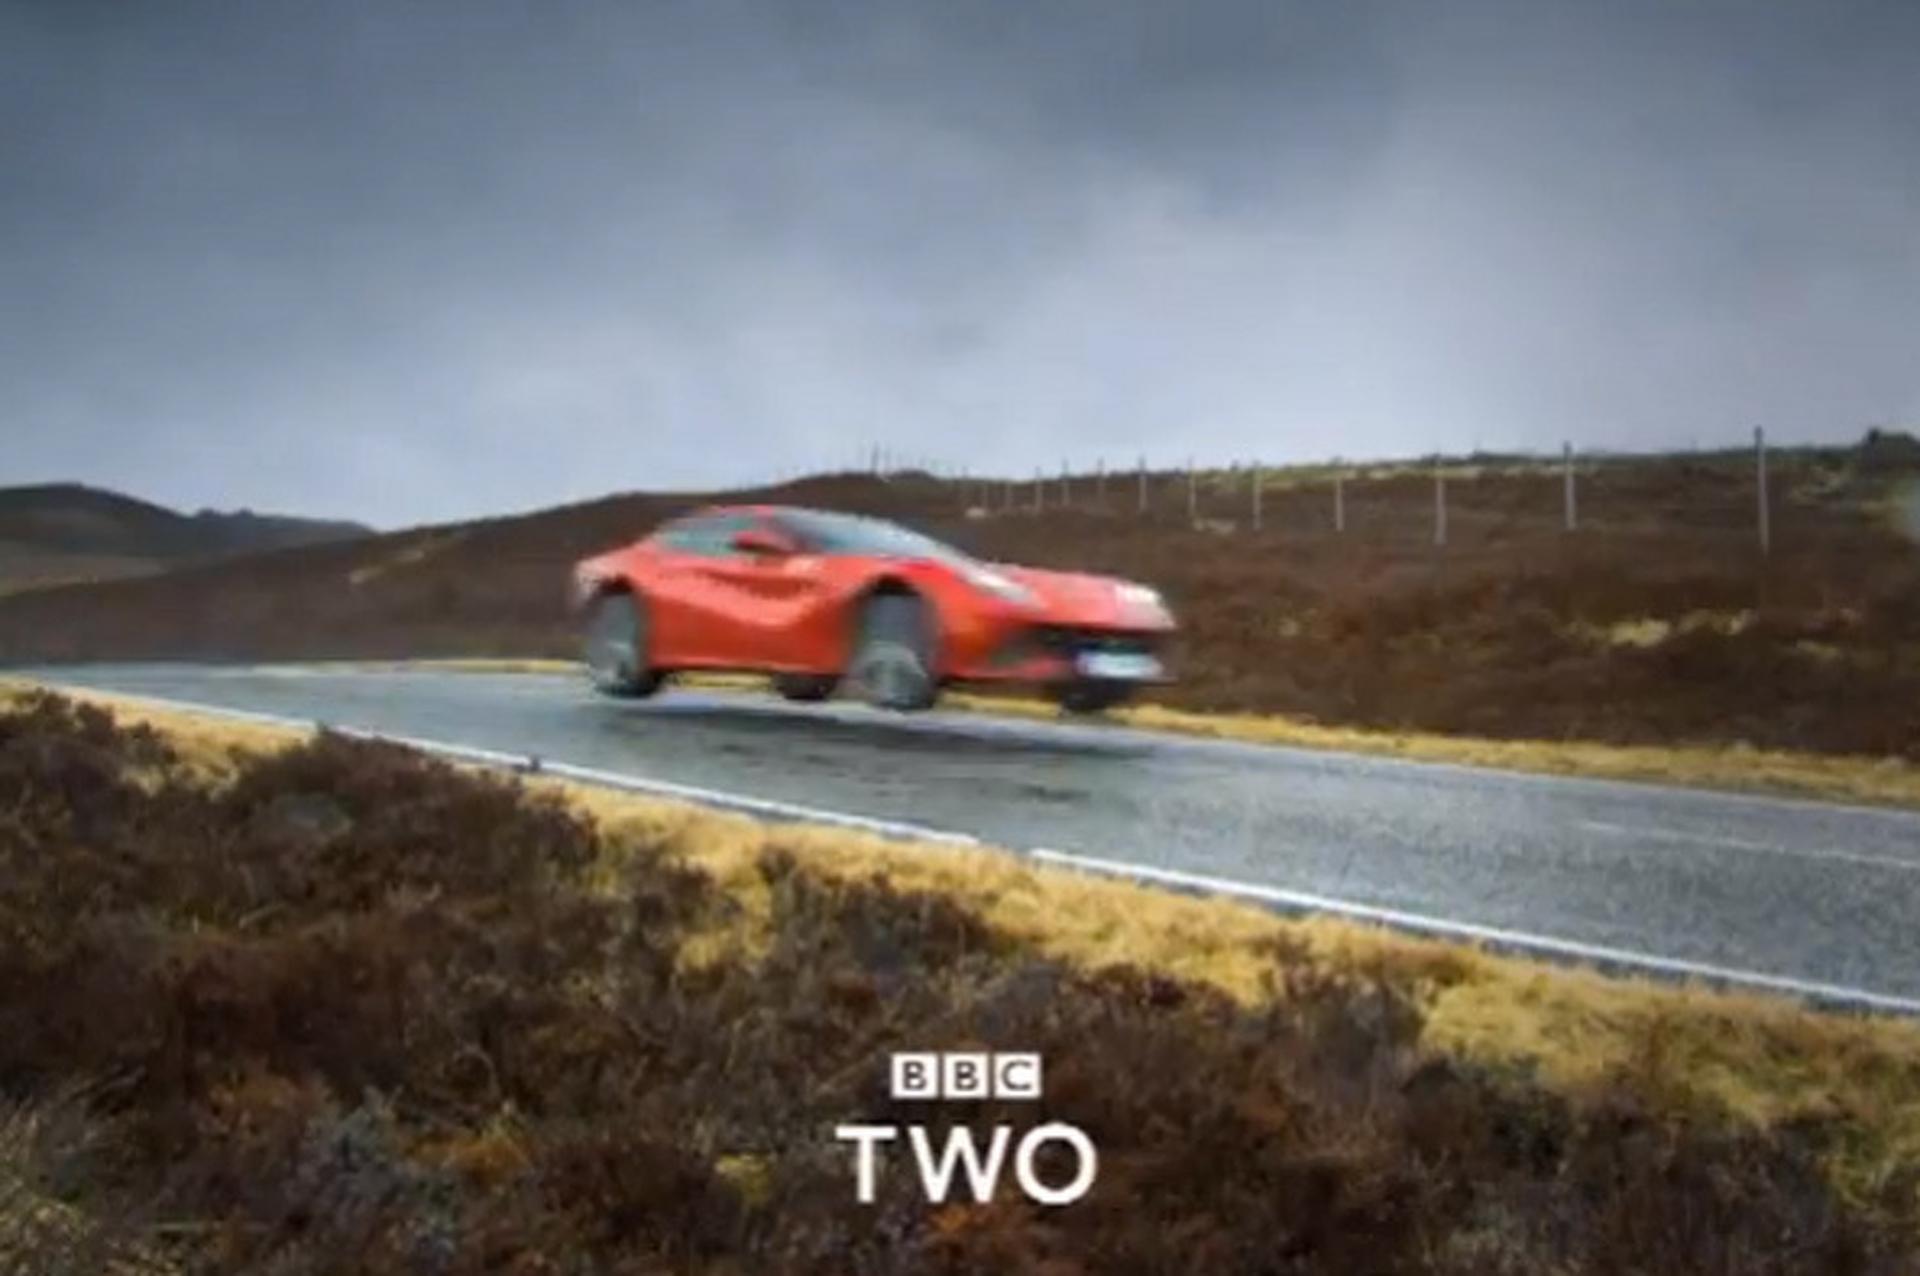 Top Gear Teases New Season By Jumping Ferrari [video]